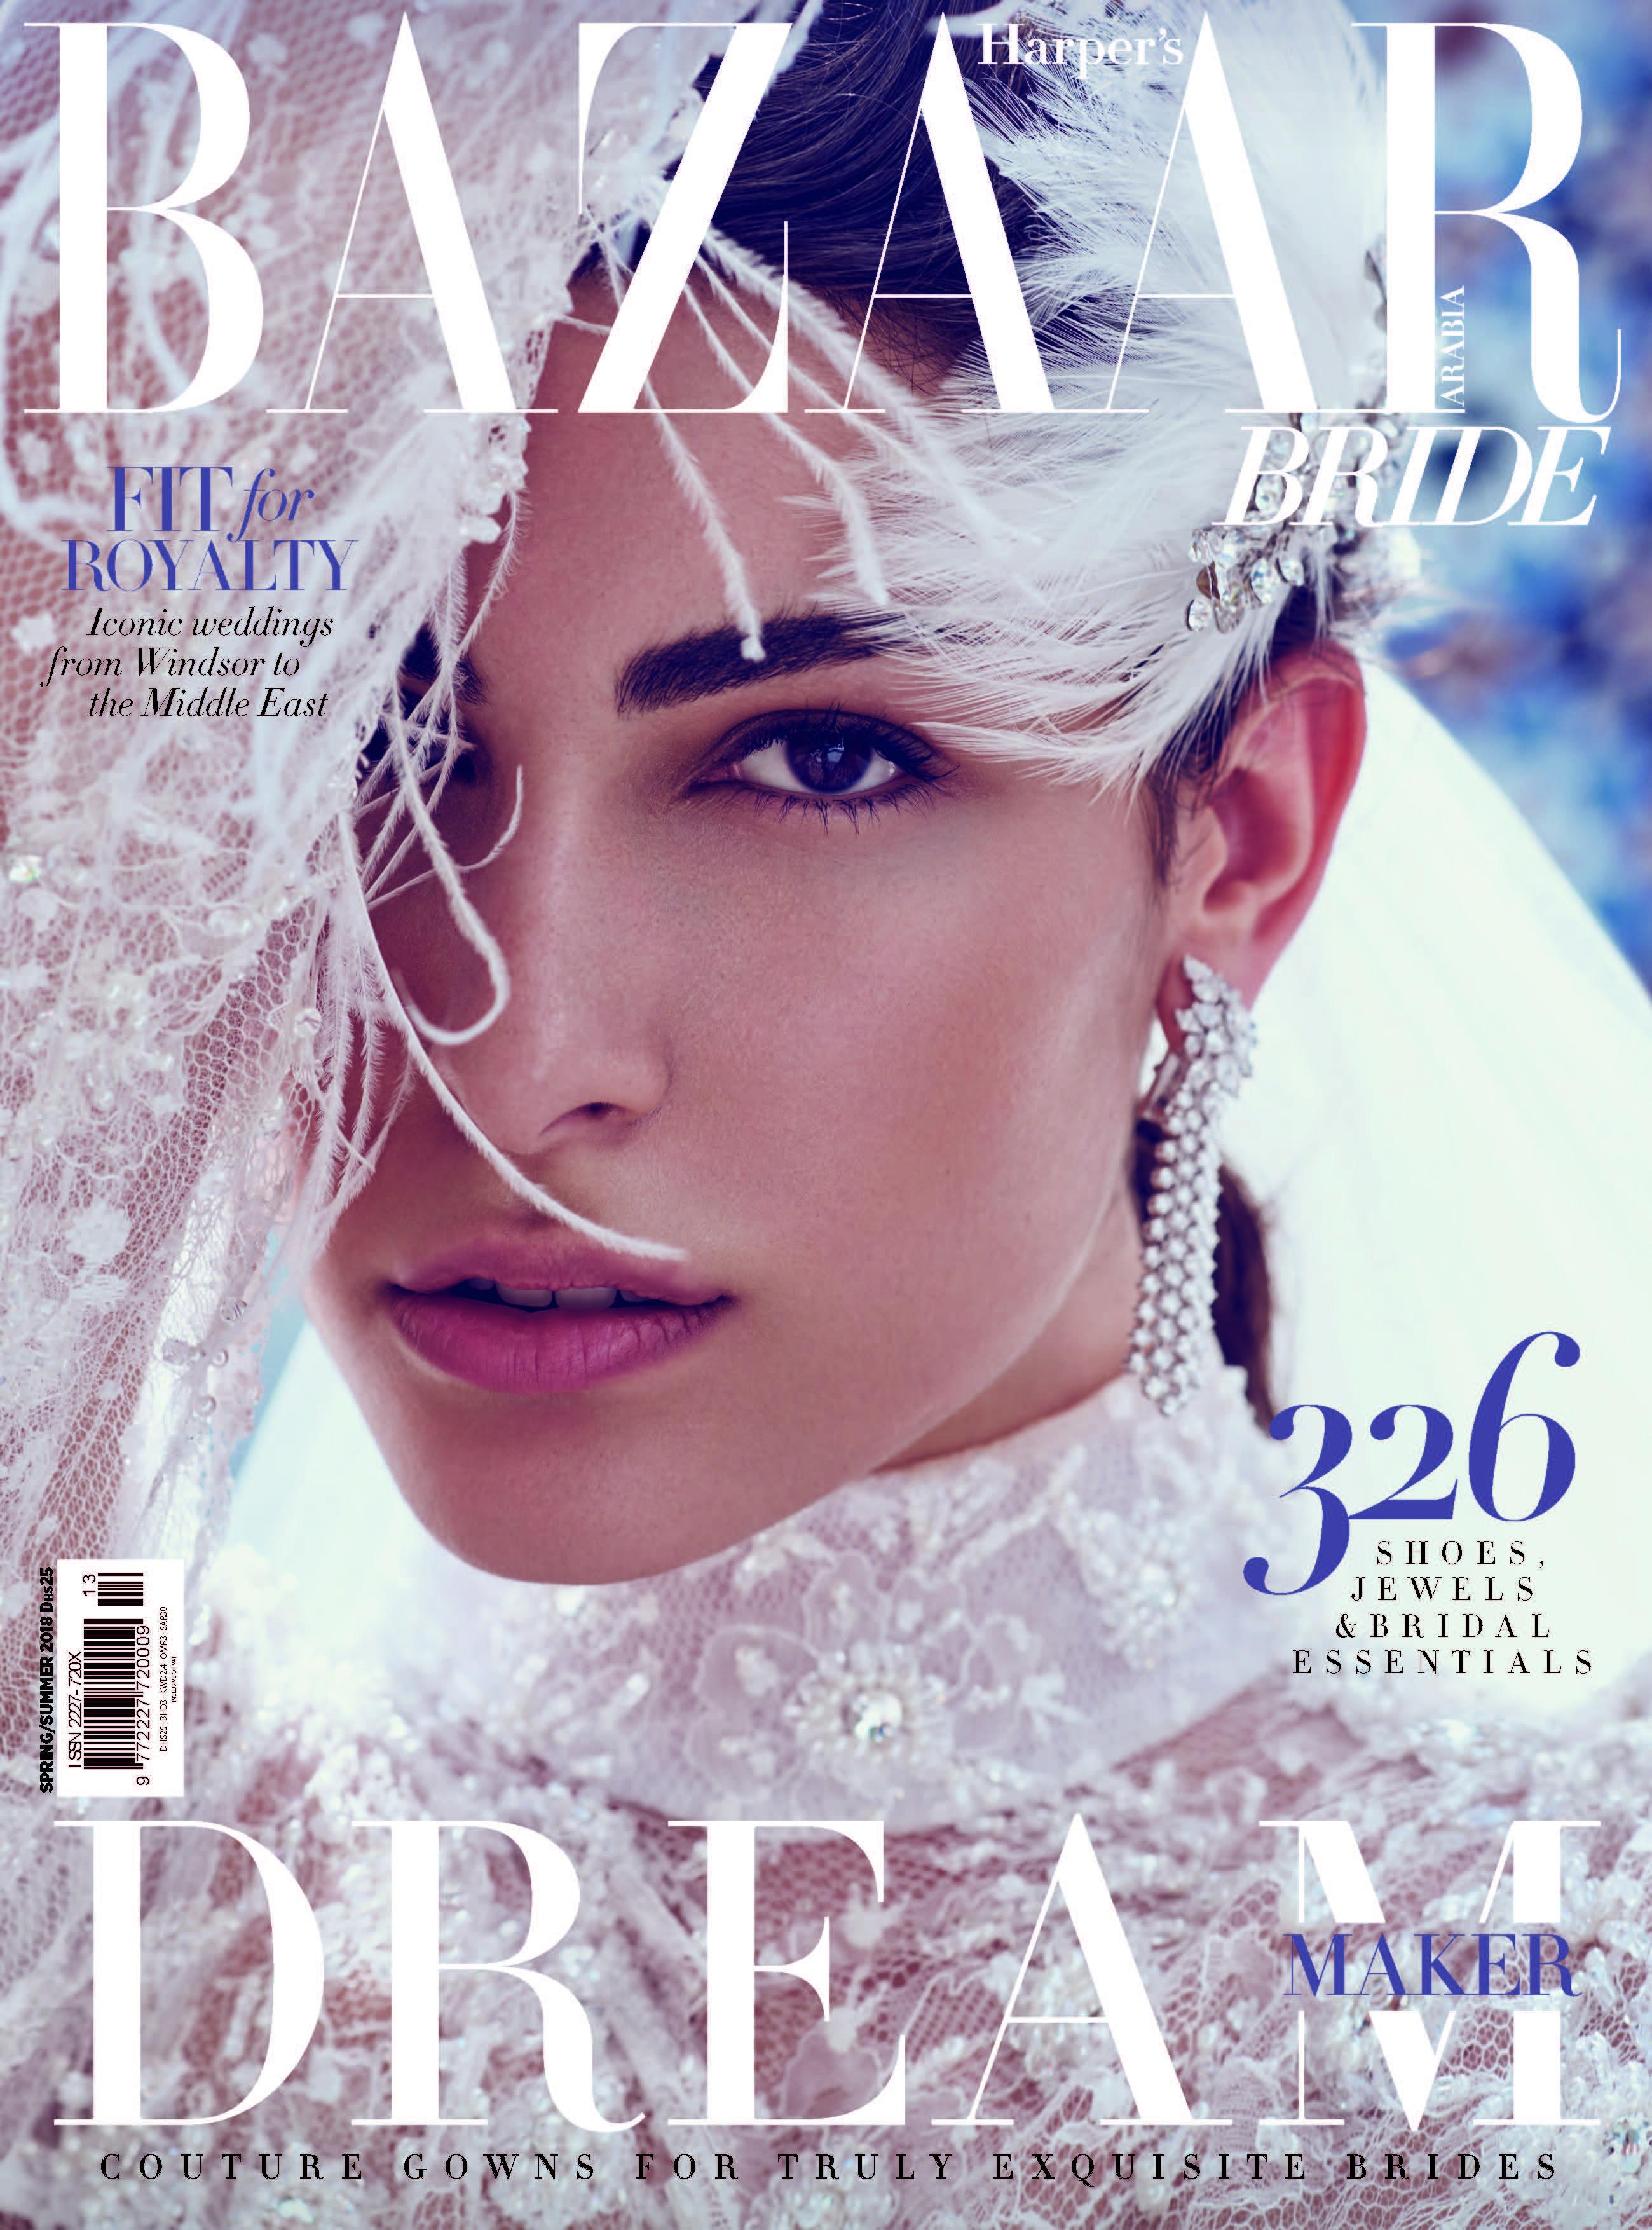 Harper's Bazar Cover